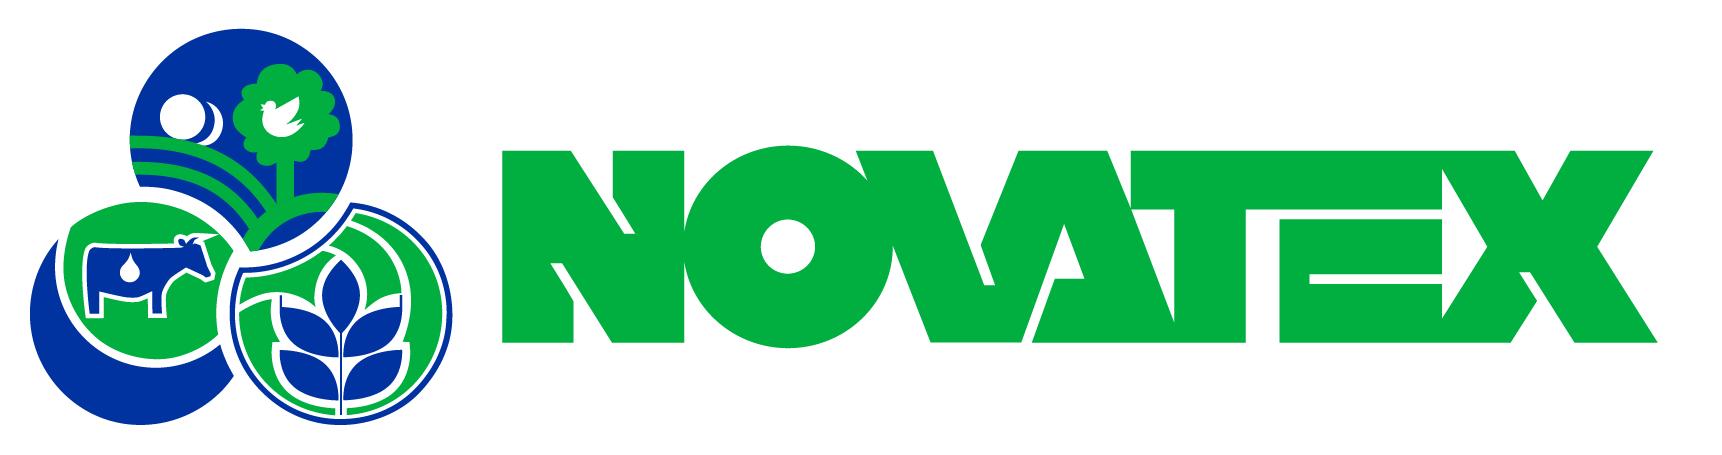 Novatex Blog